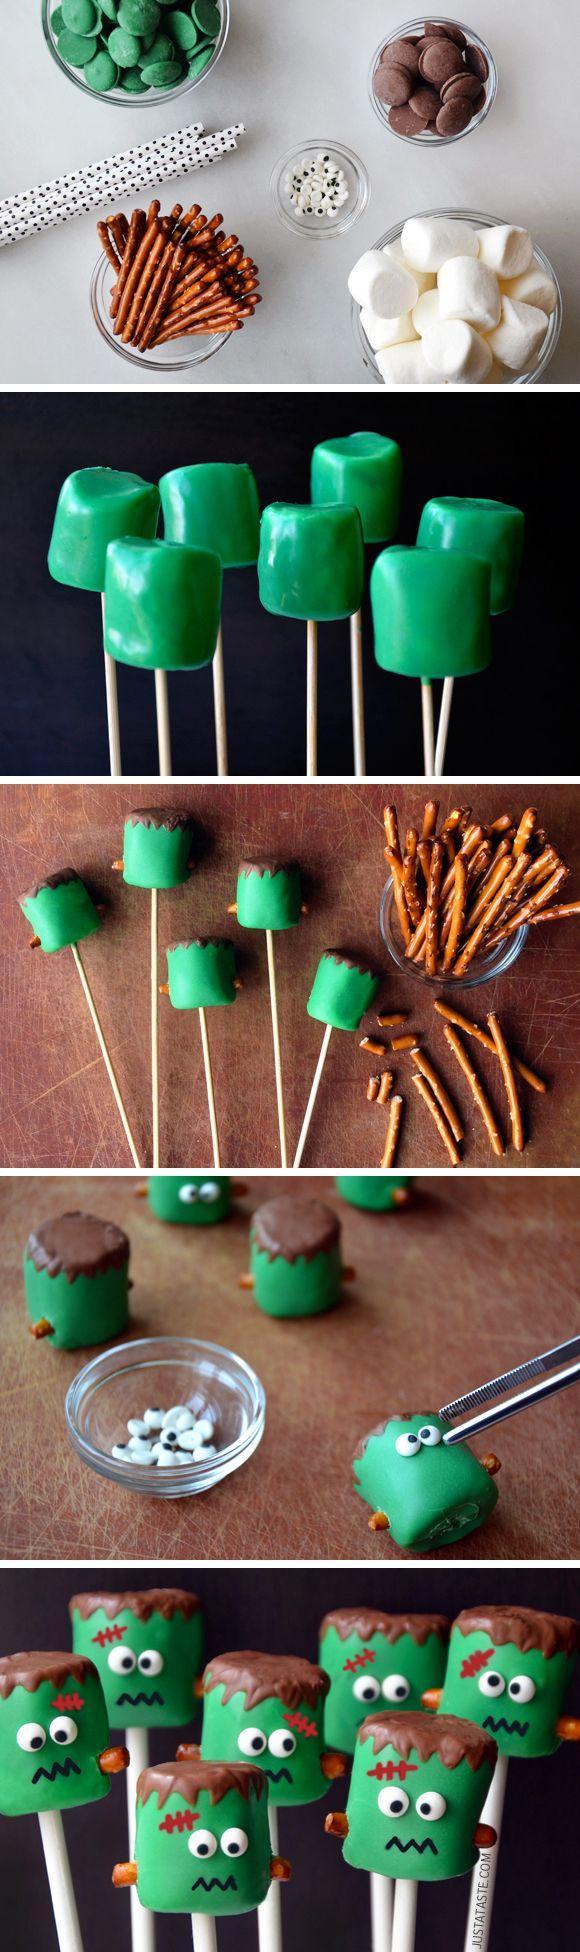 Frankenstein Marshmallow Pops from justataste.com  - cute for Halloween.